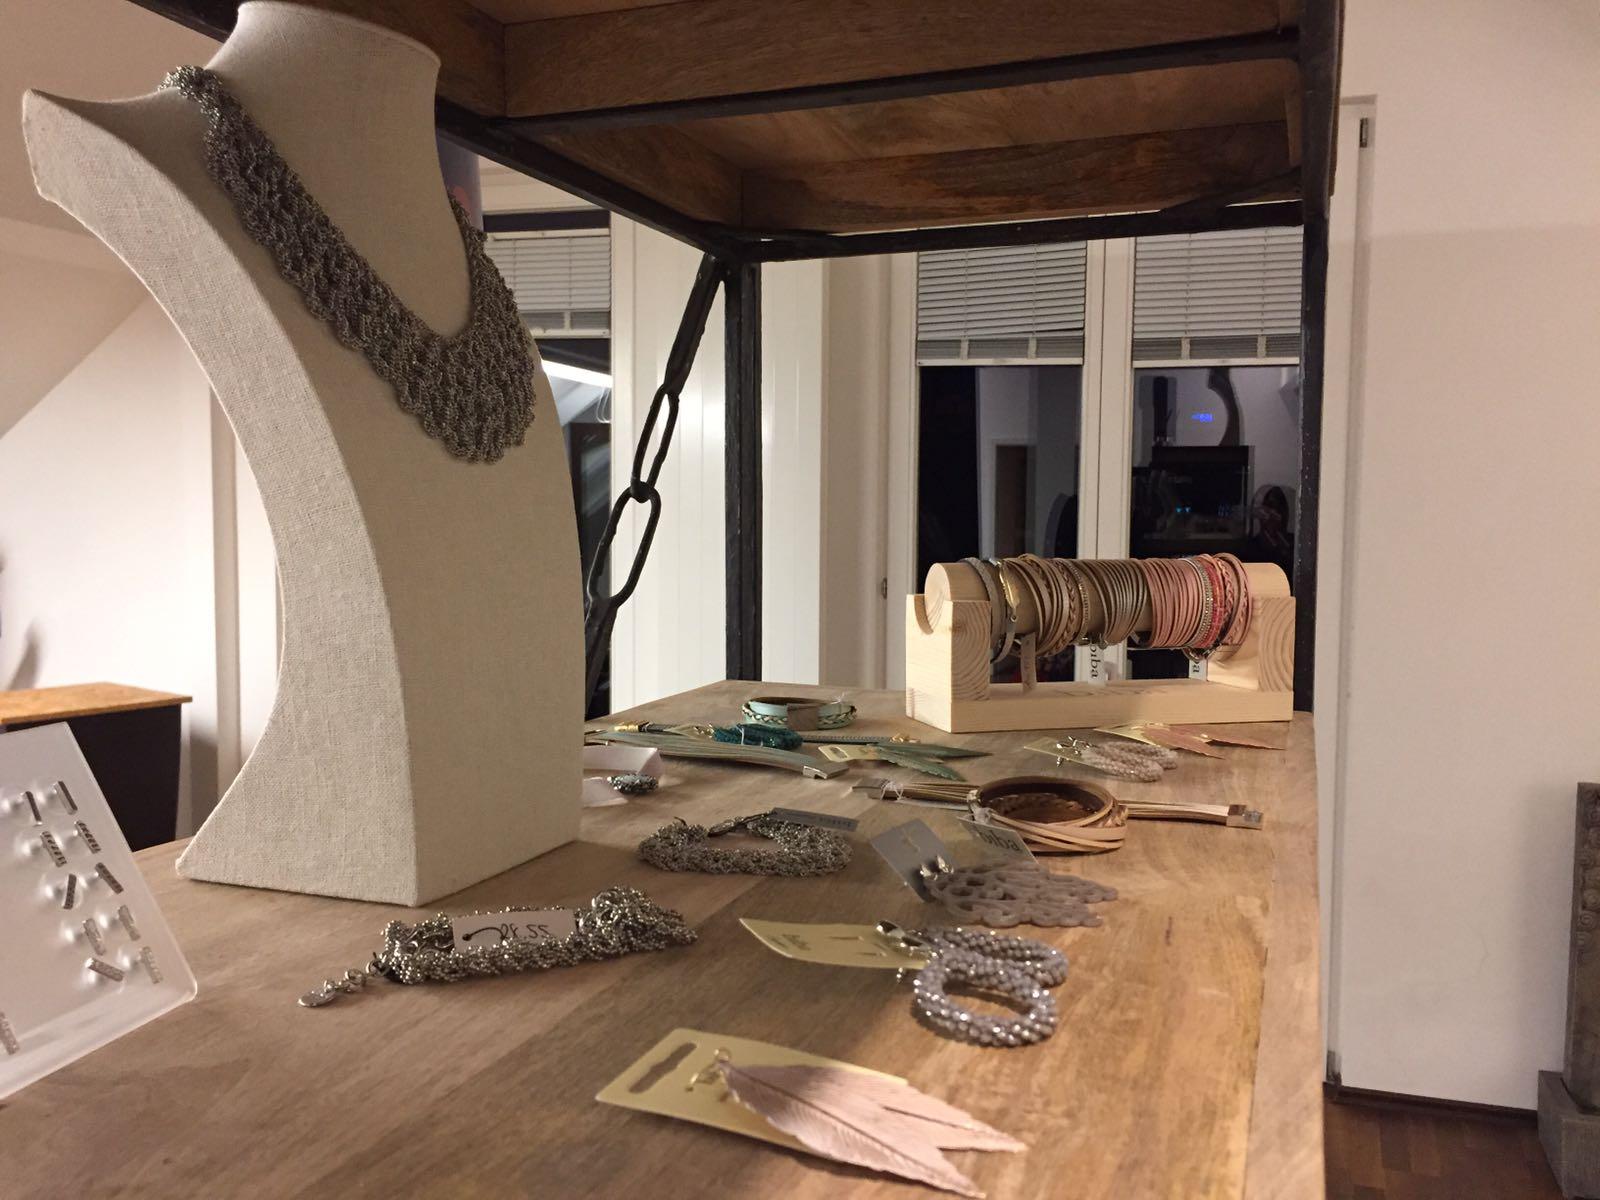 schmuckkollektion biba esilo hairlounge estilo hairlounge friseur in heilbronn. Black Bedroom Furniture Sets. Home Design Ideas